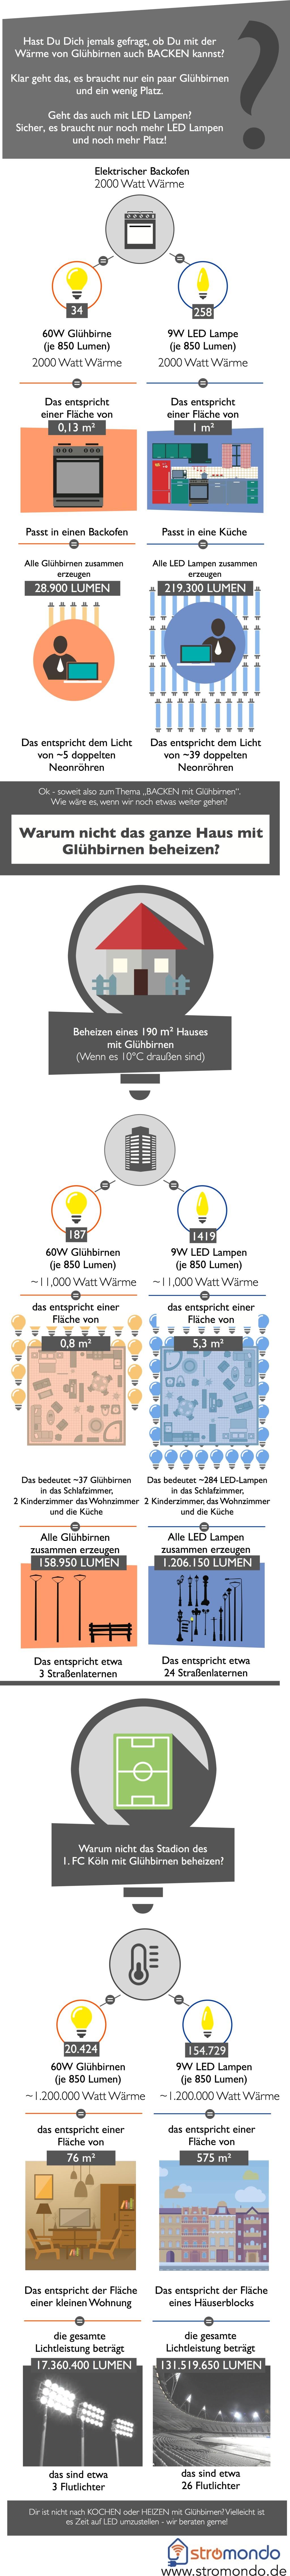 Stromondo-infografik-kochen-led